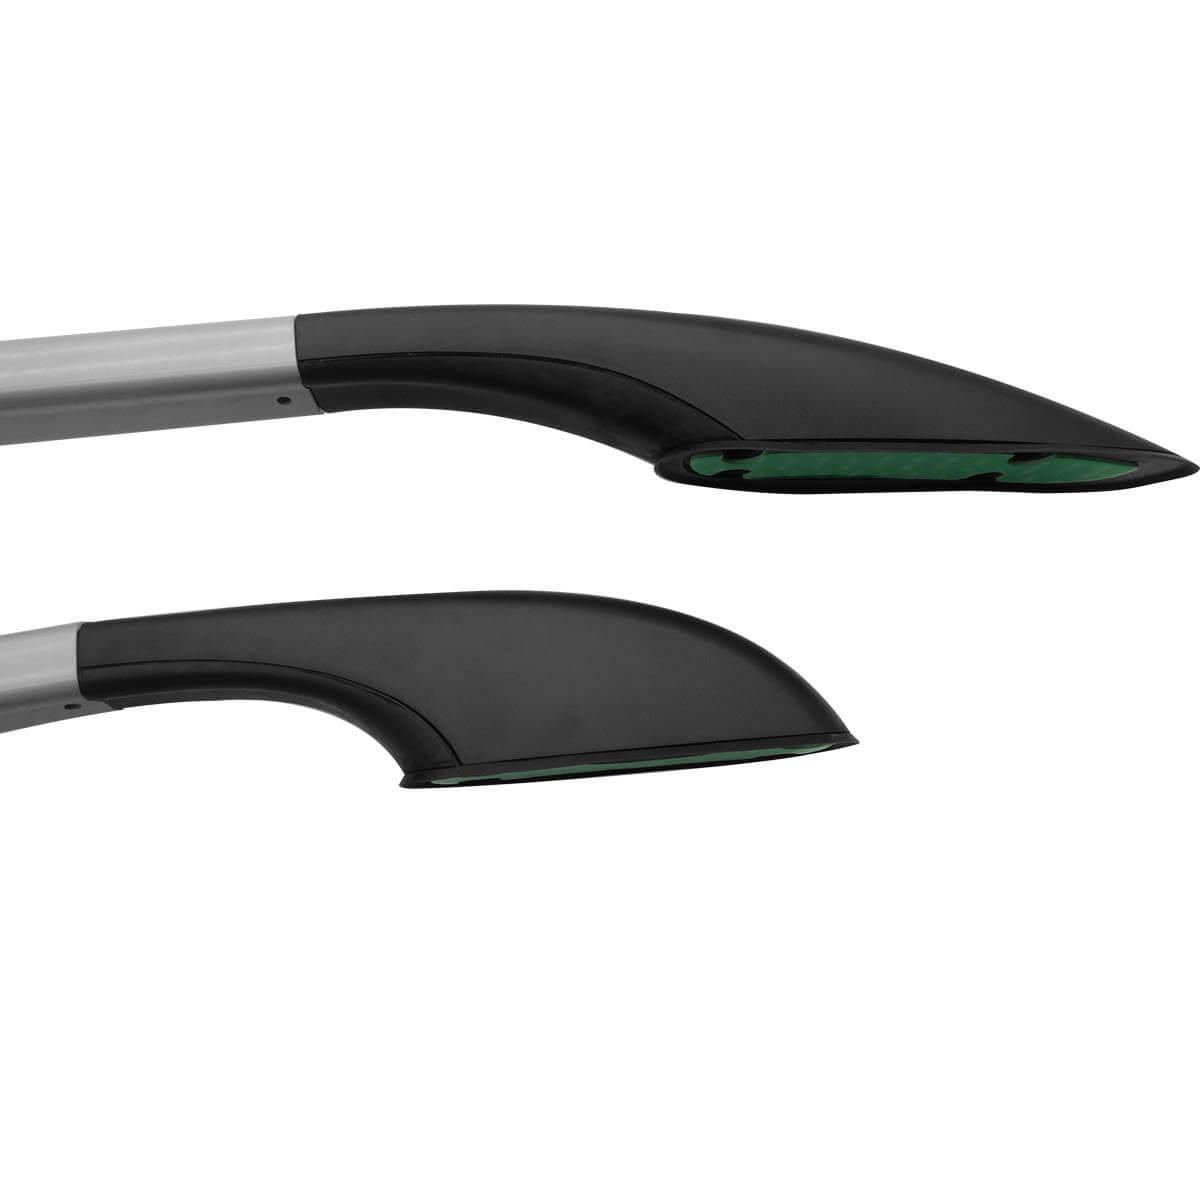 Longarina de teto VF decorativa HB20 ou HB20S 2013 a 2021 alumínio prata